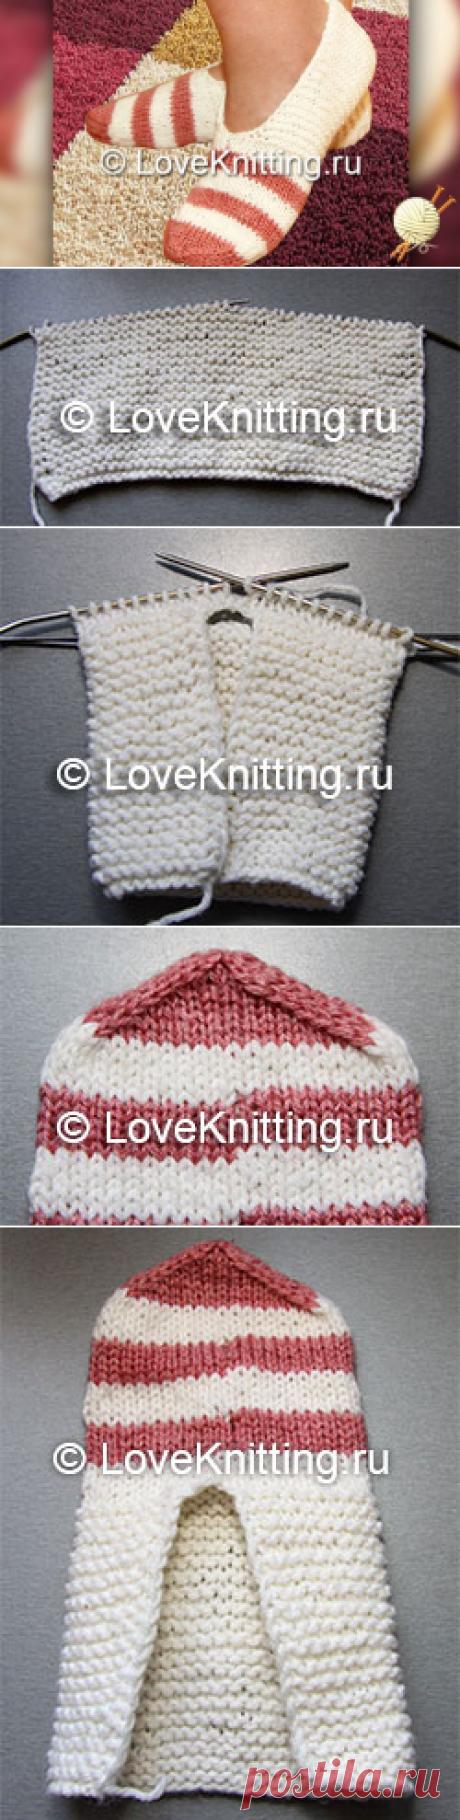 28.03.2015 | Loveknitting.ru